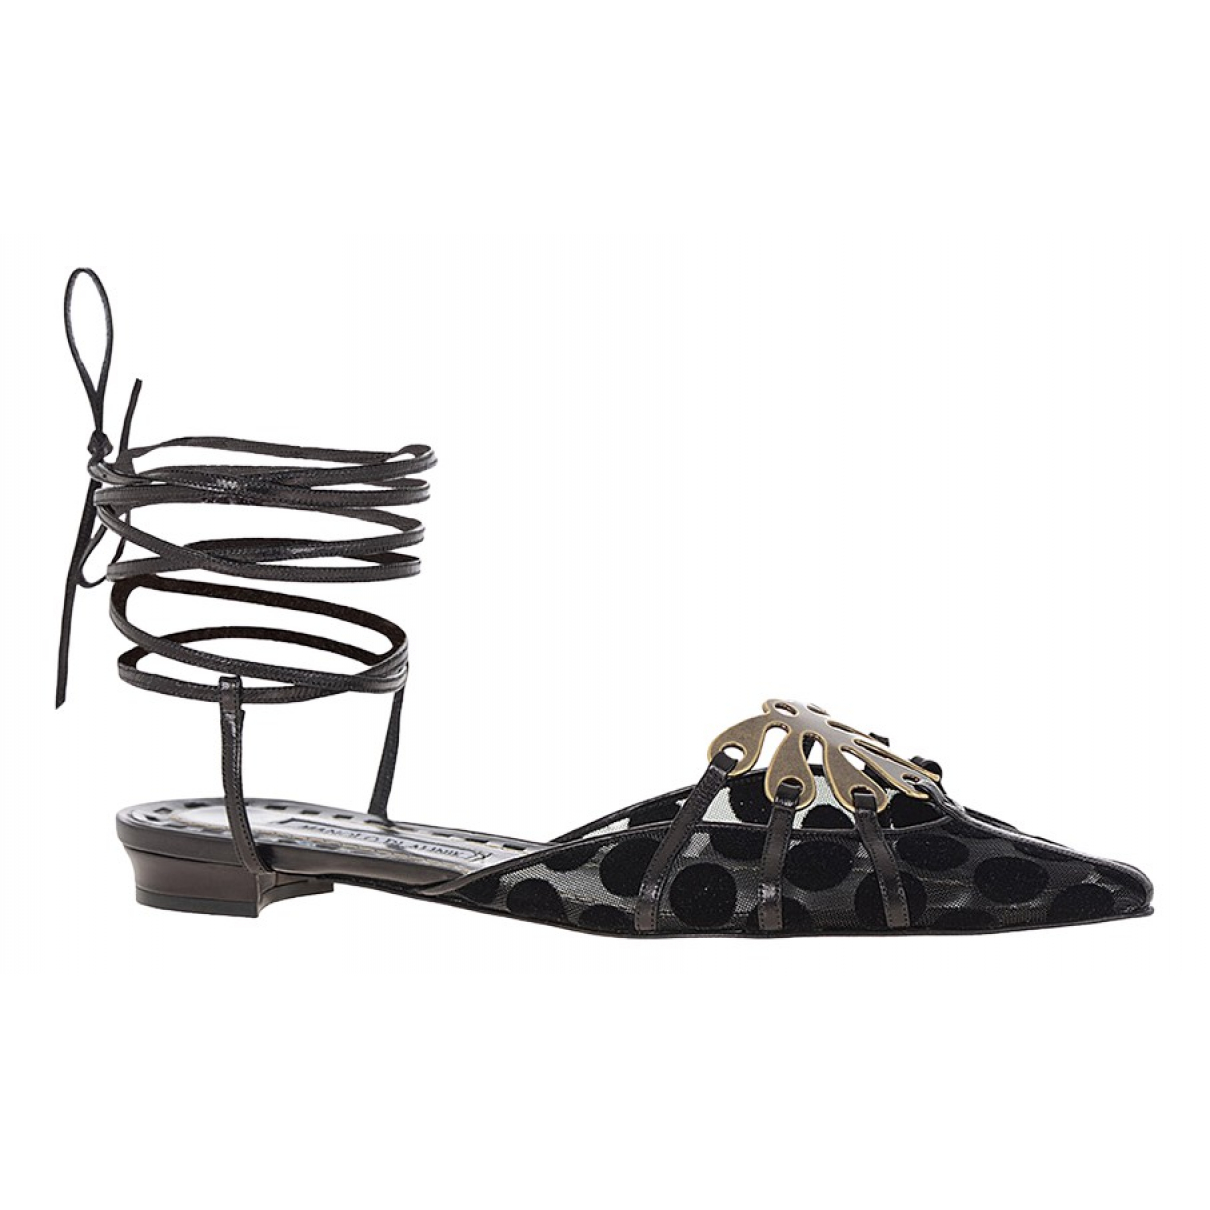 Manolo Blahnik N Black Cloth Sandals for Women 37 EU